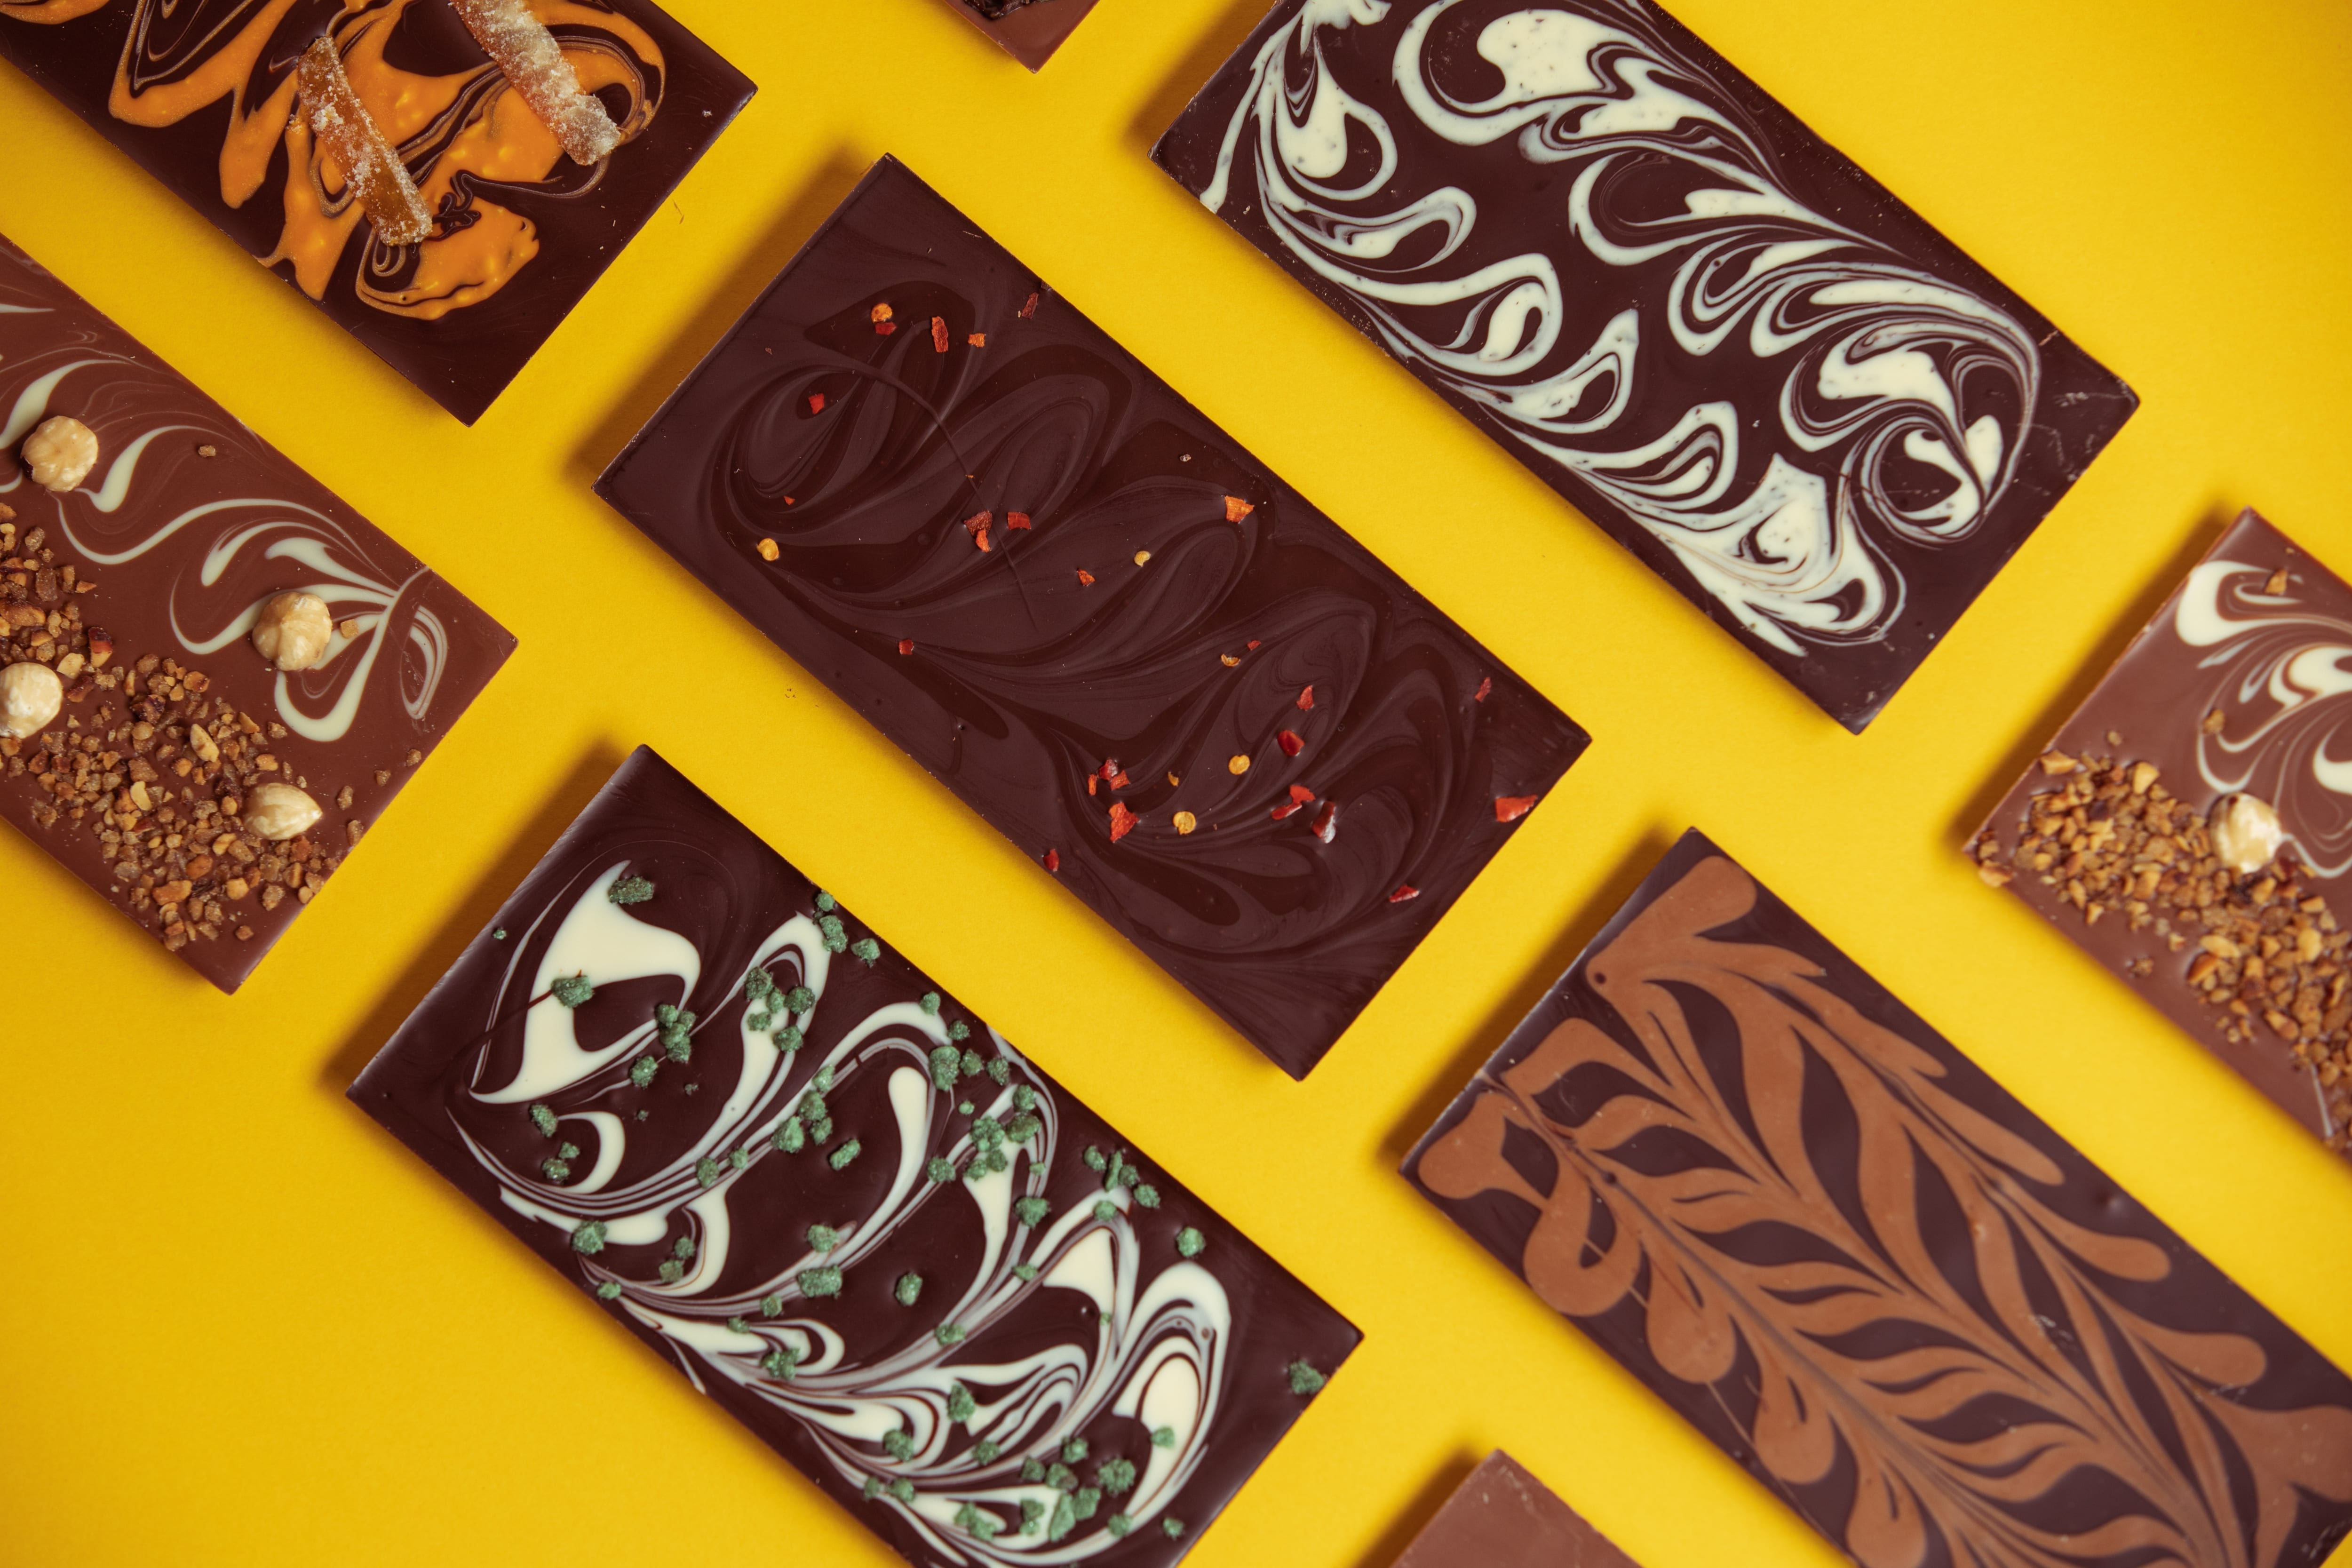 Wilde Irish Chocolates - Midnight Mint chocolate bar